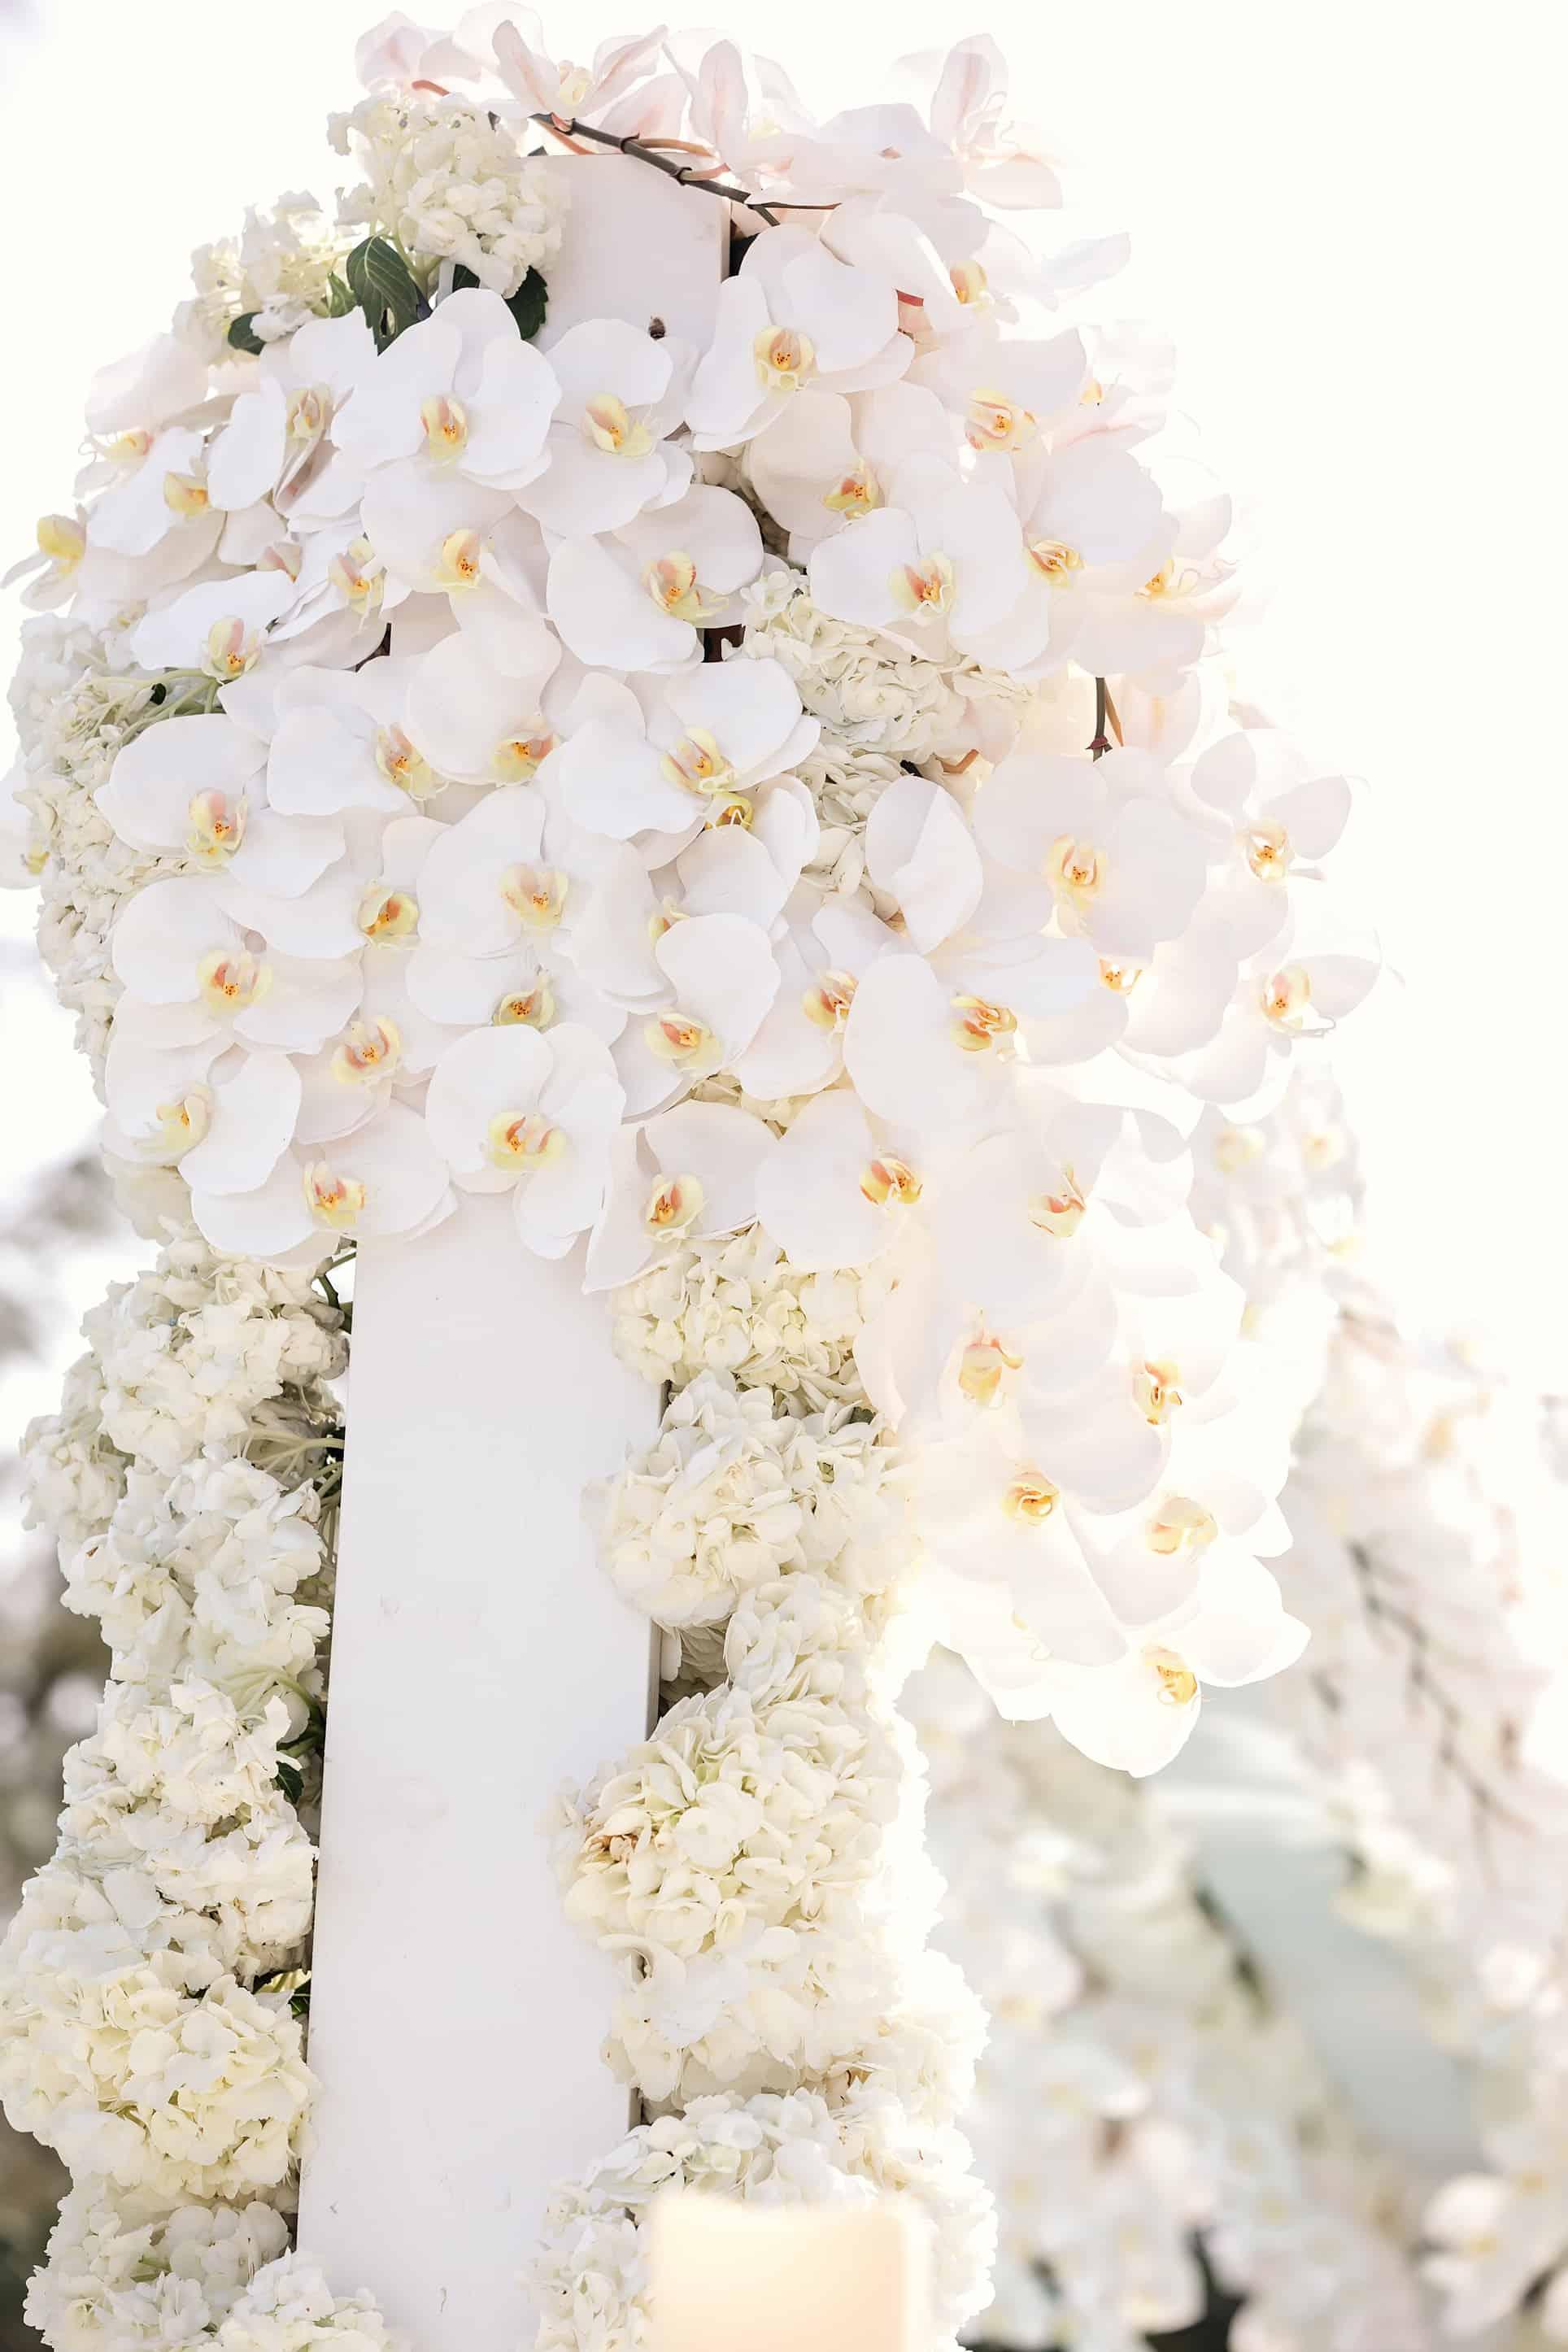 Silver White Destination Wedding Design and Decor by JoAnne V Brown of Celebrations Ltd & JVB Design House in the Cayman Islands